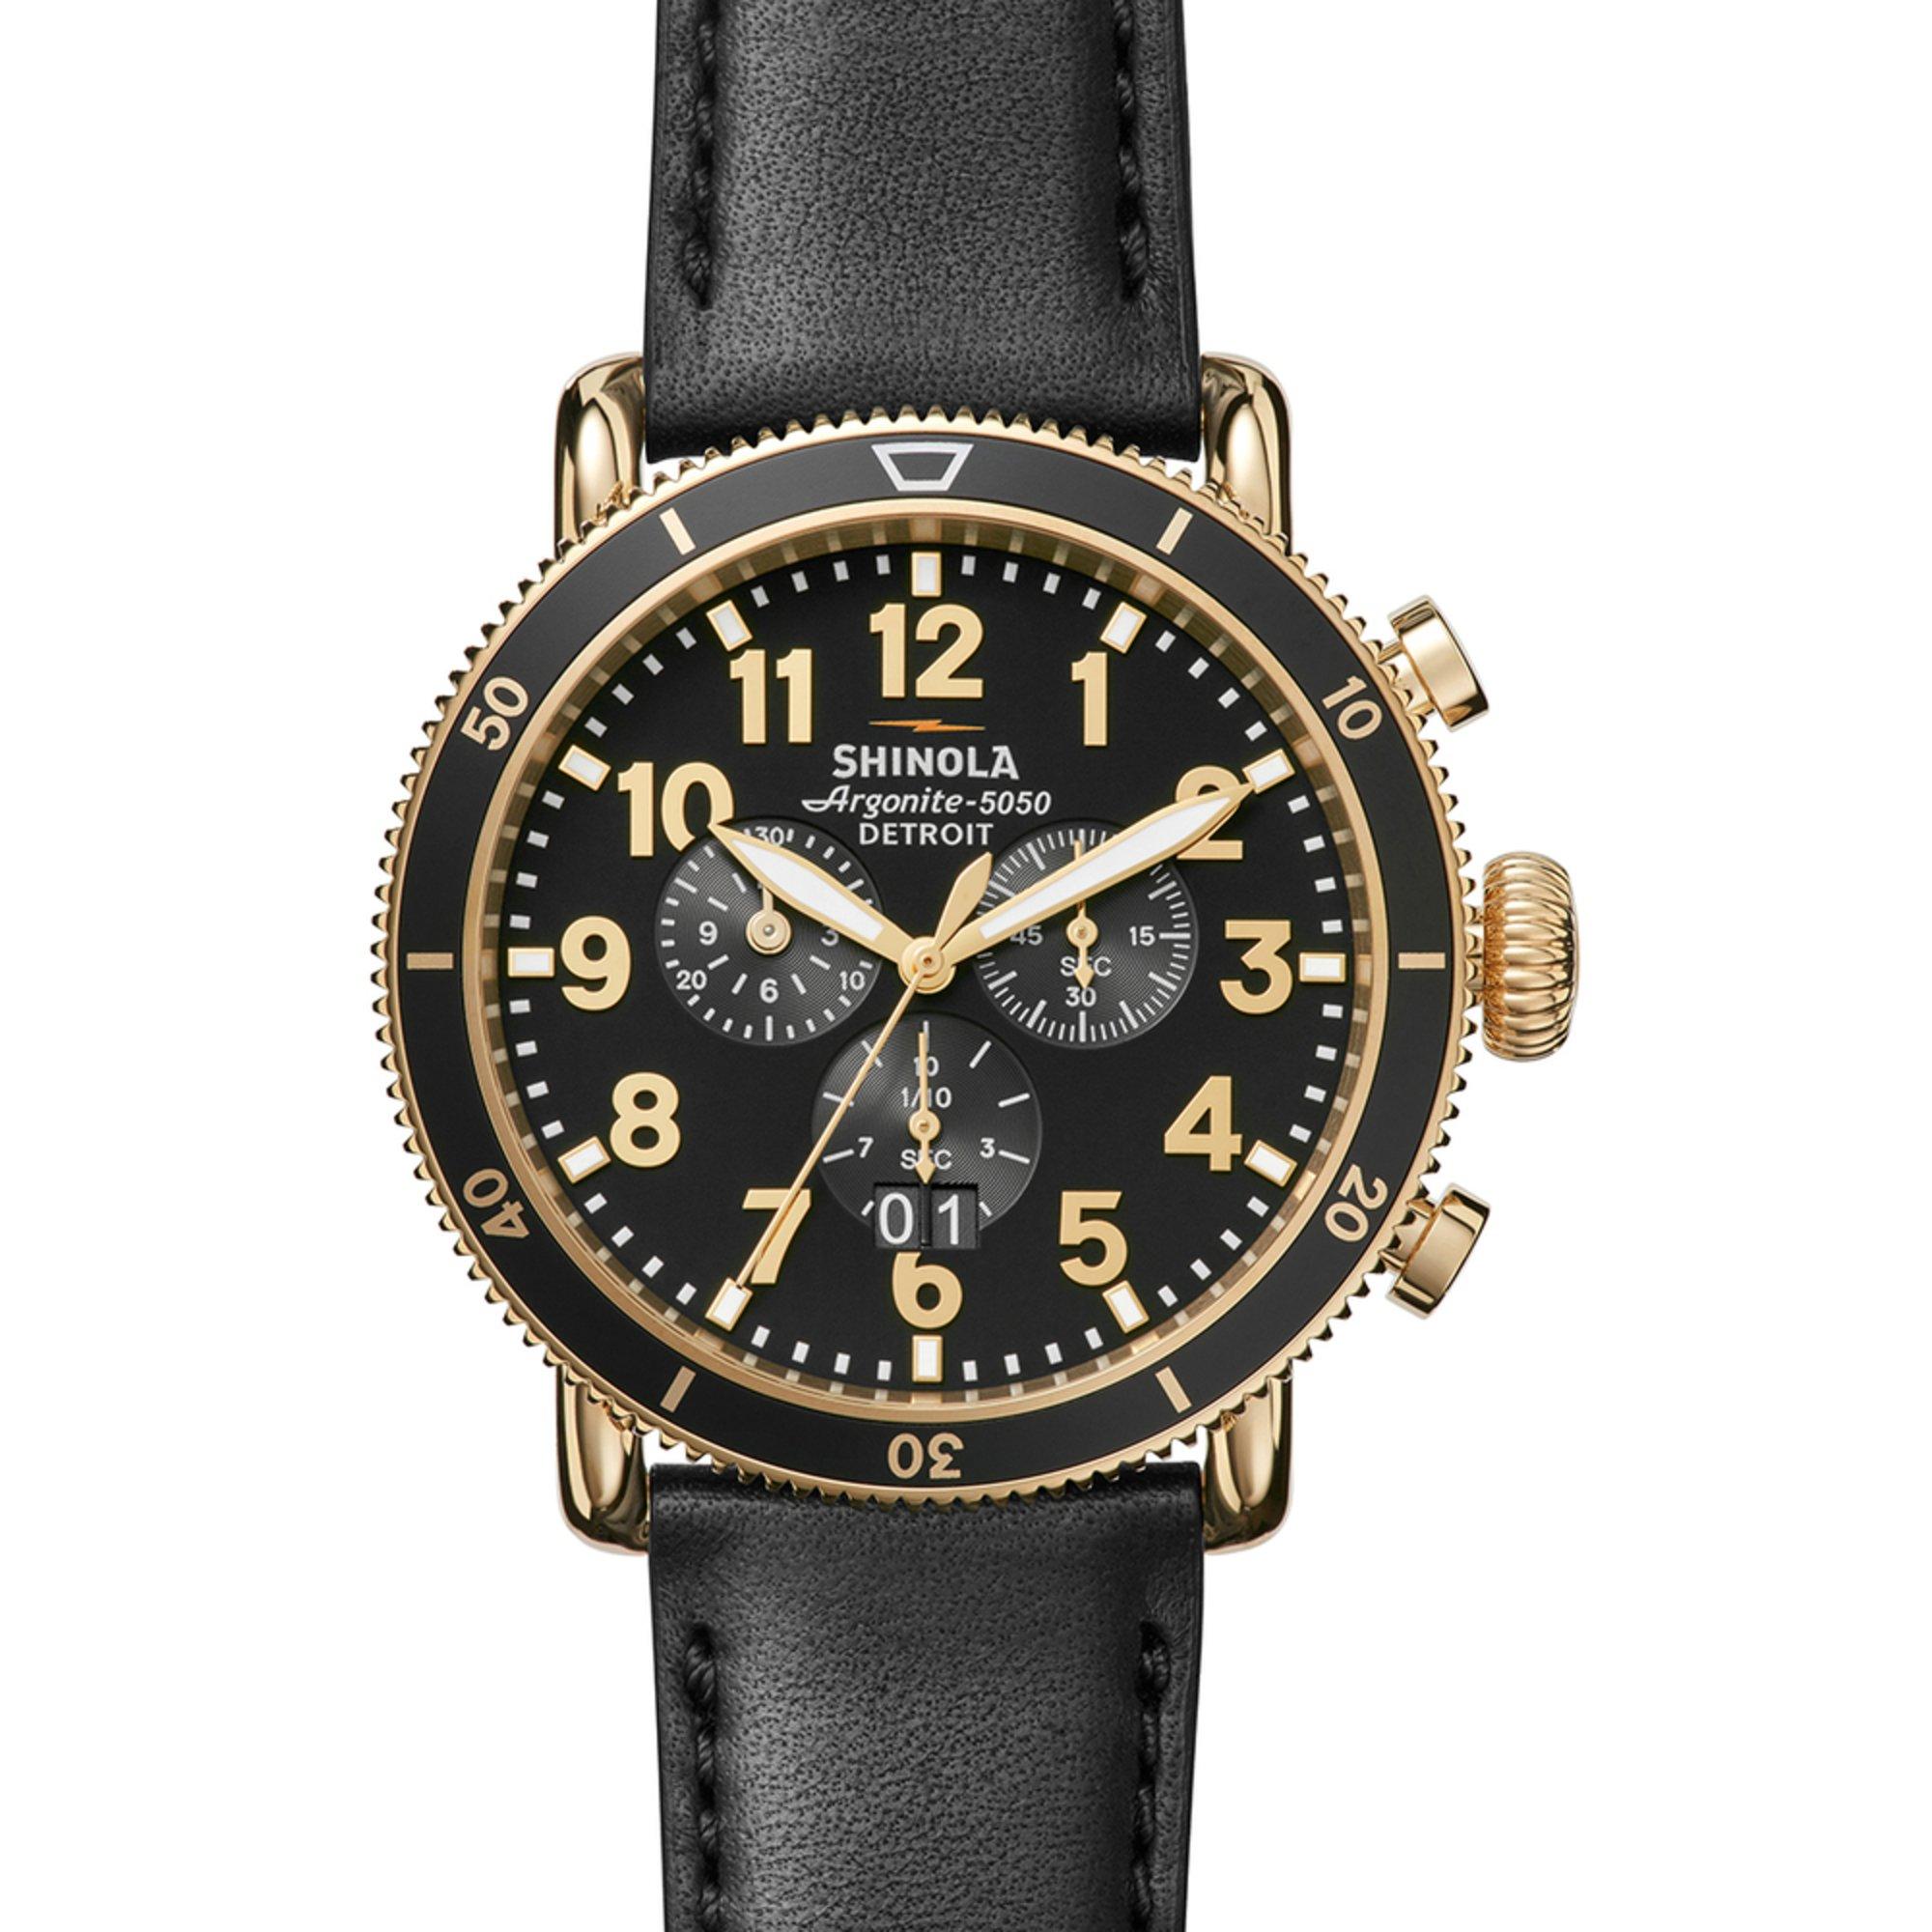 Shinola men 39 s runwell chrono watch s0120044138 midnight blue tan leather 48mm men 39 s watches for Shinola watches